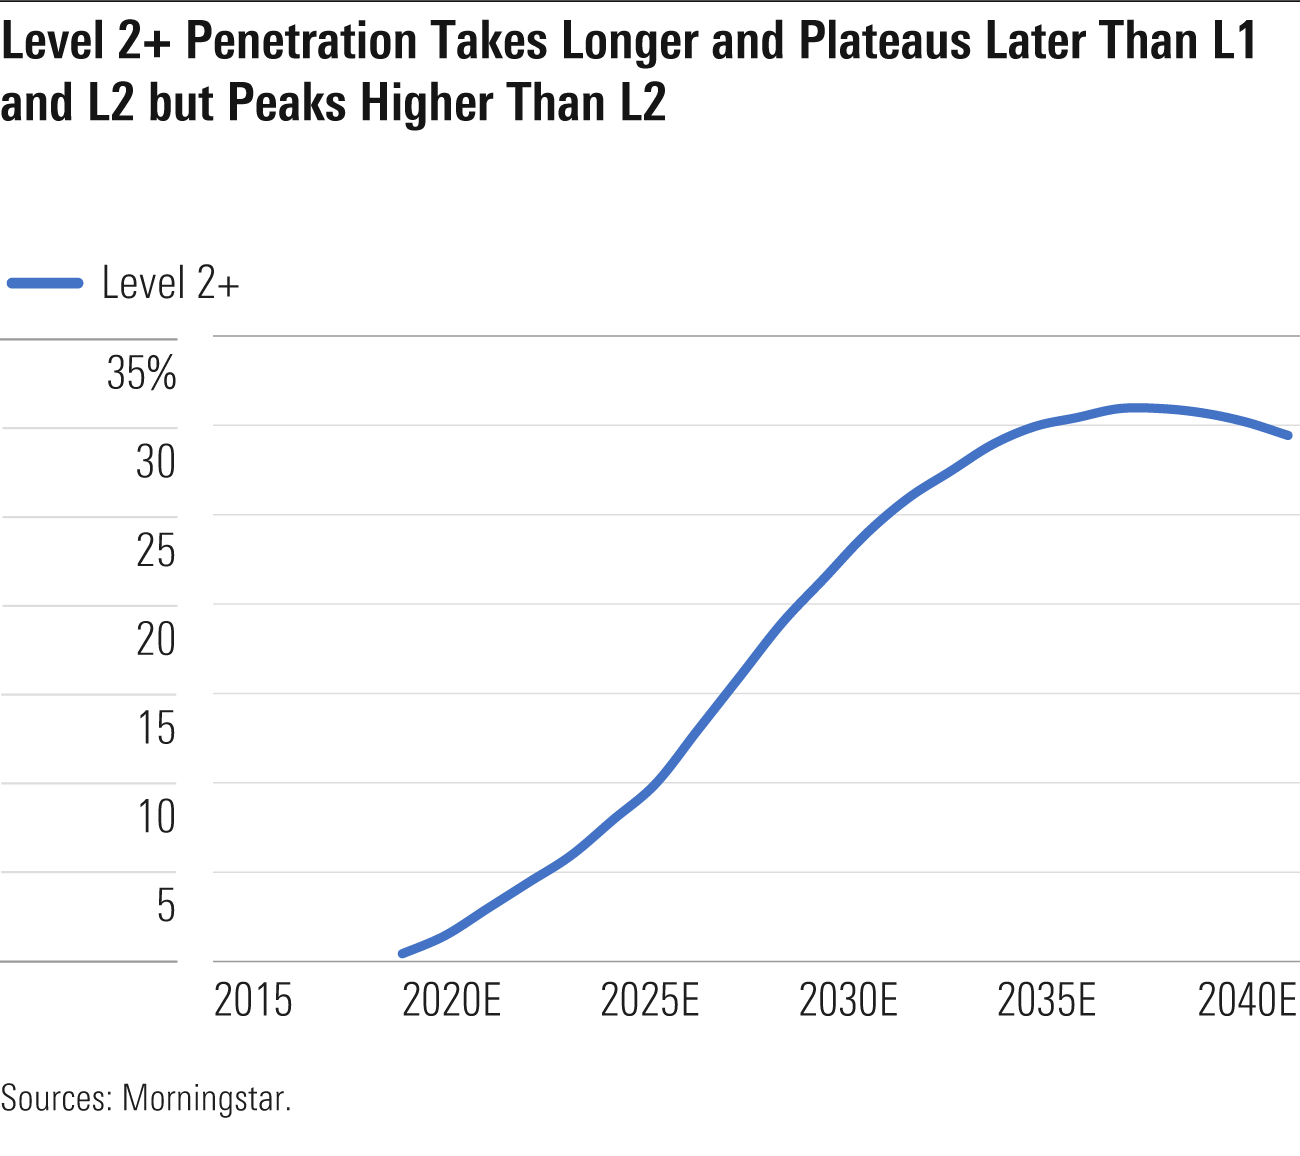 Level 2+ Penetration Takes Longer